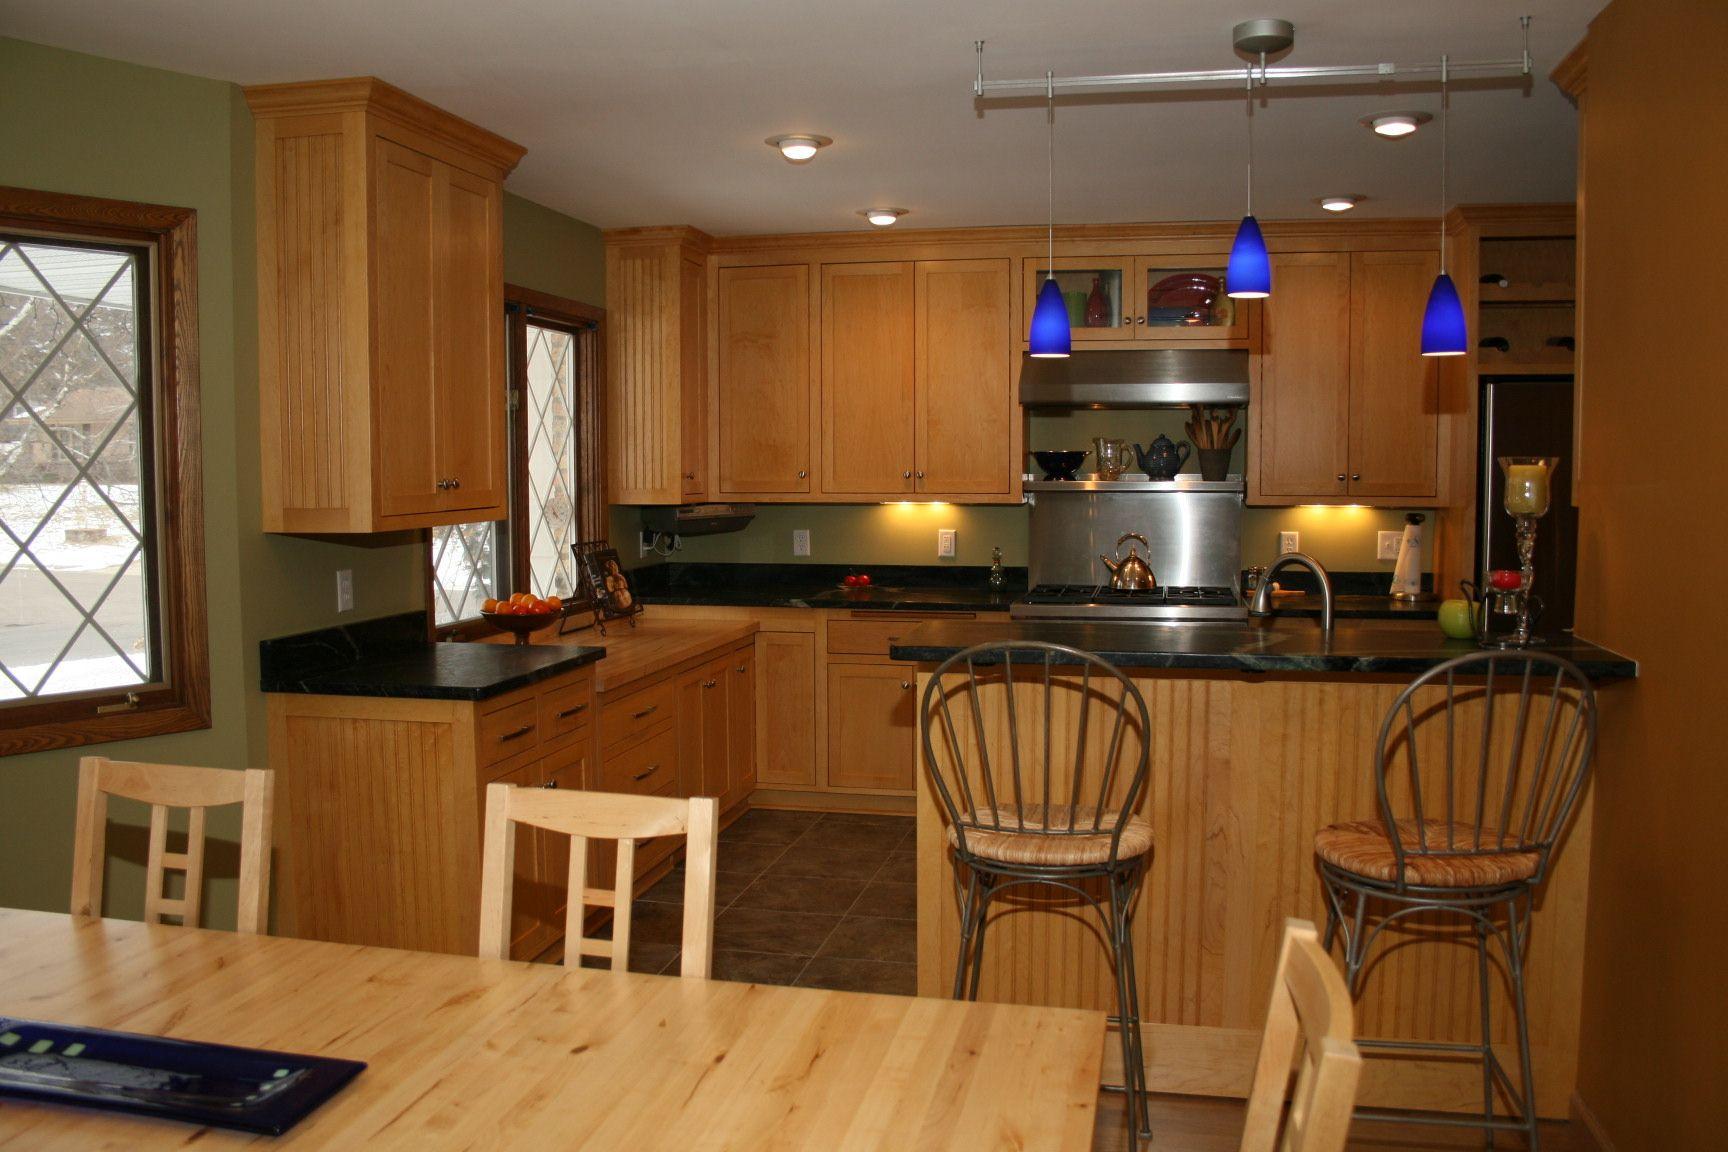 soapstone kitchen countertops Maple cabinets and soapstone countertops